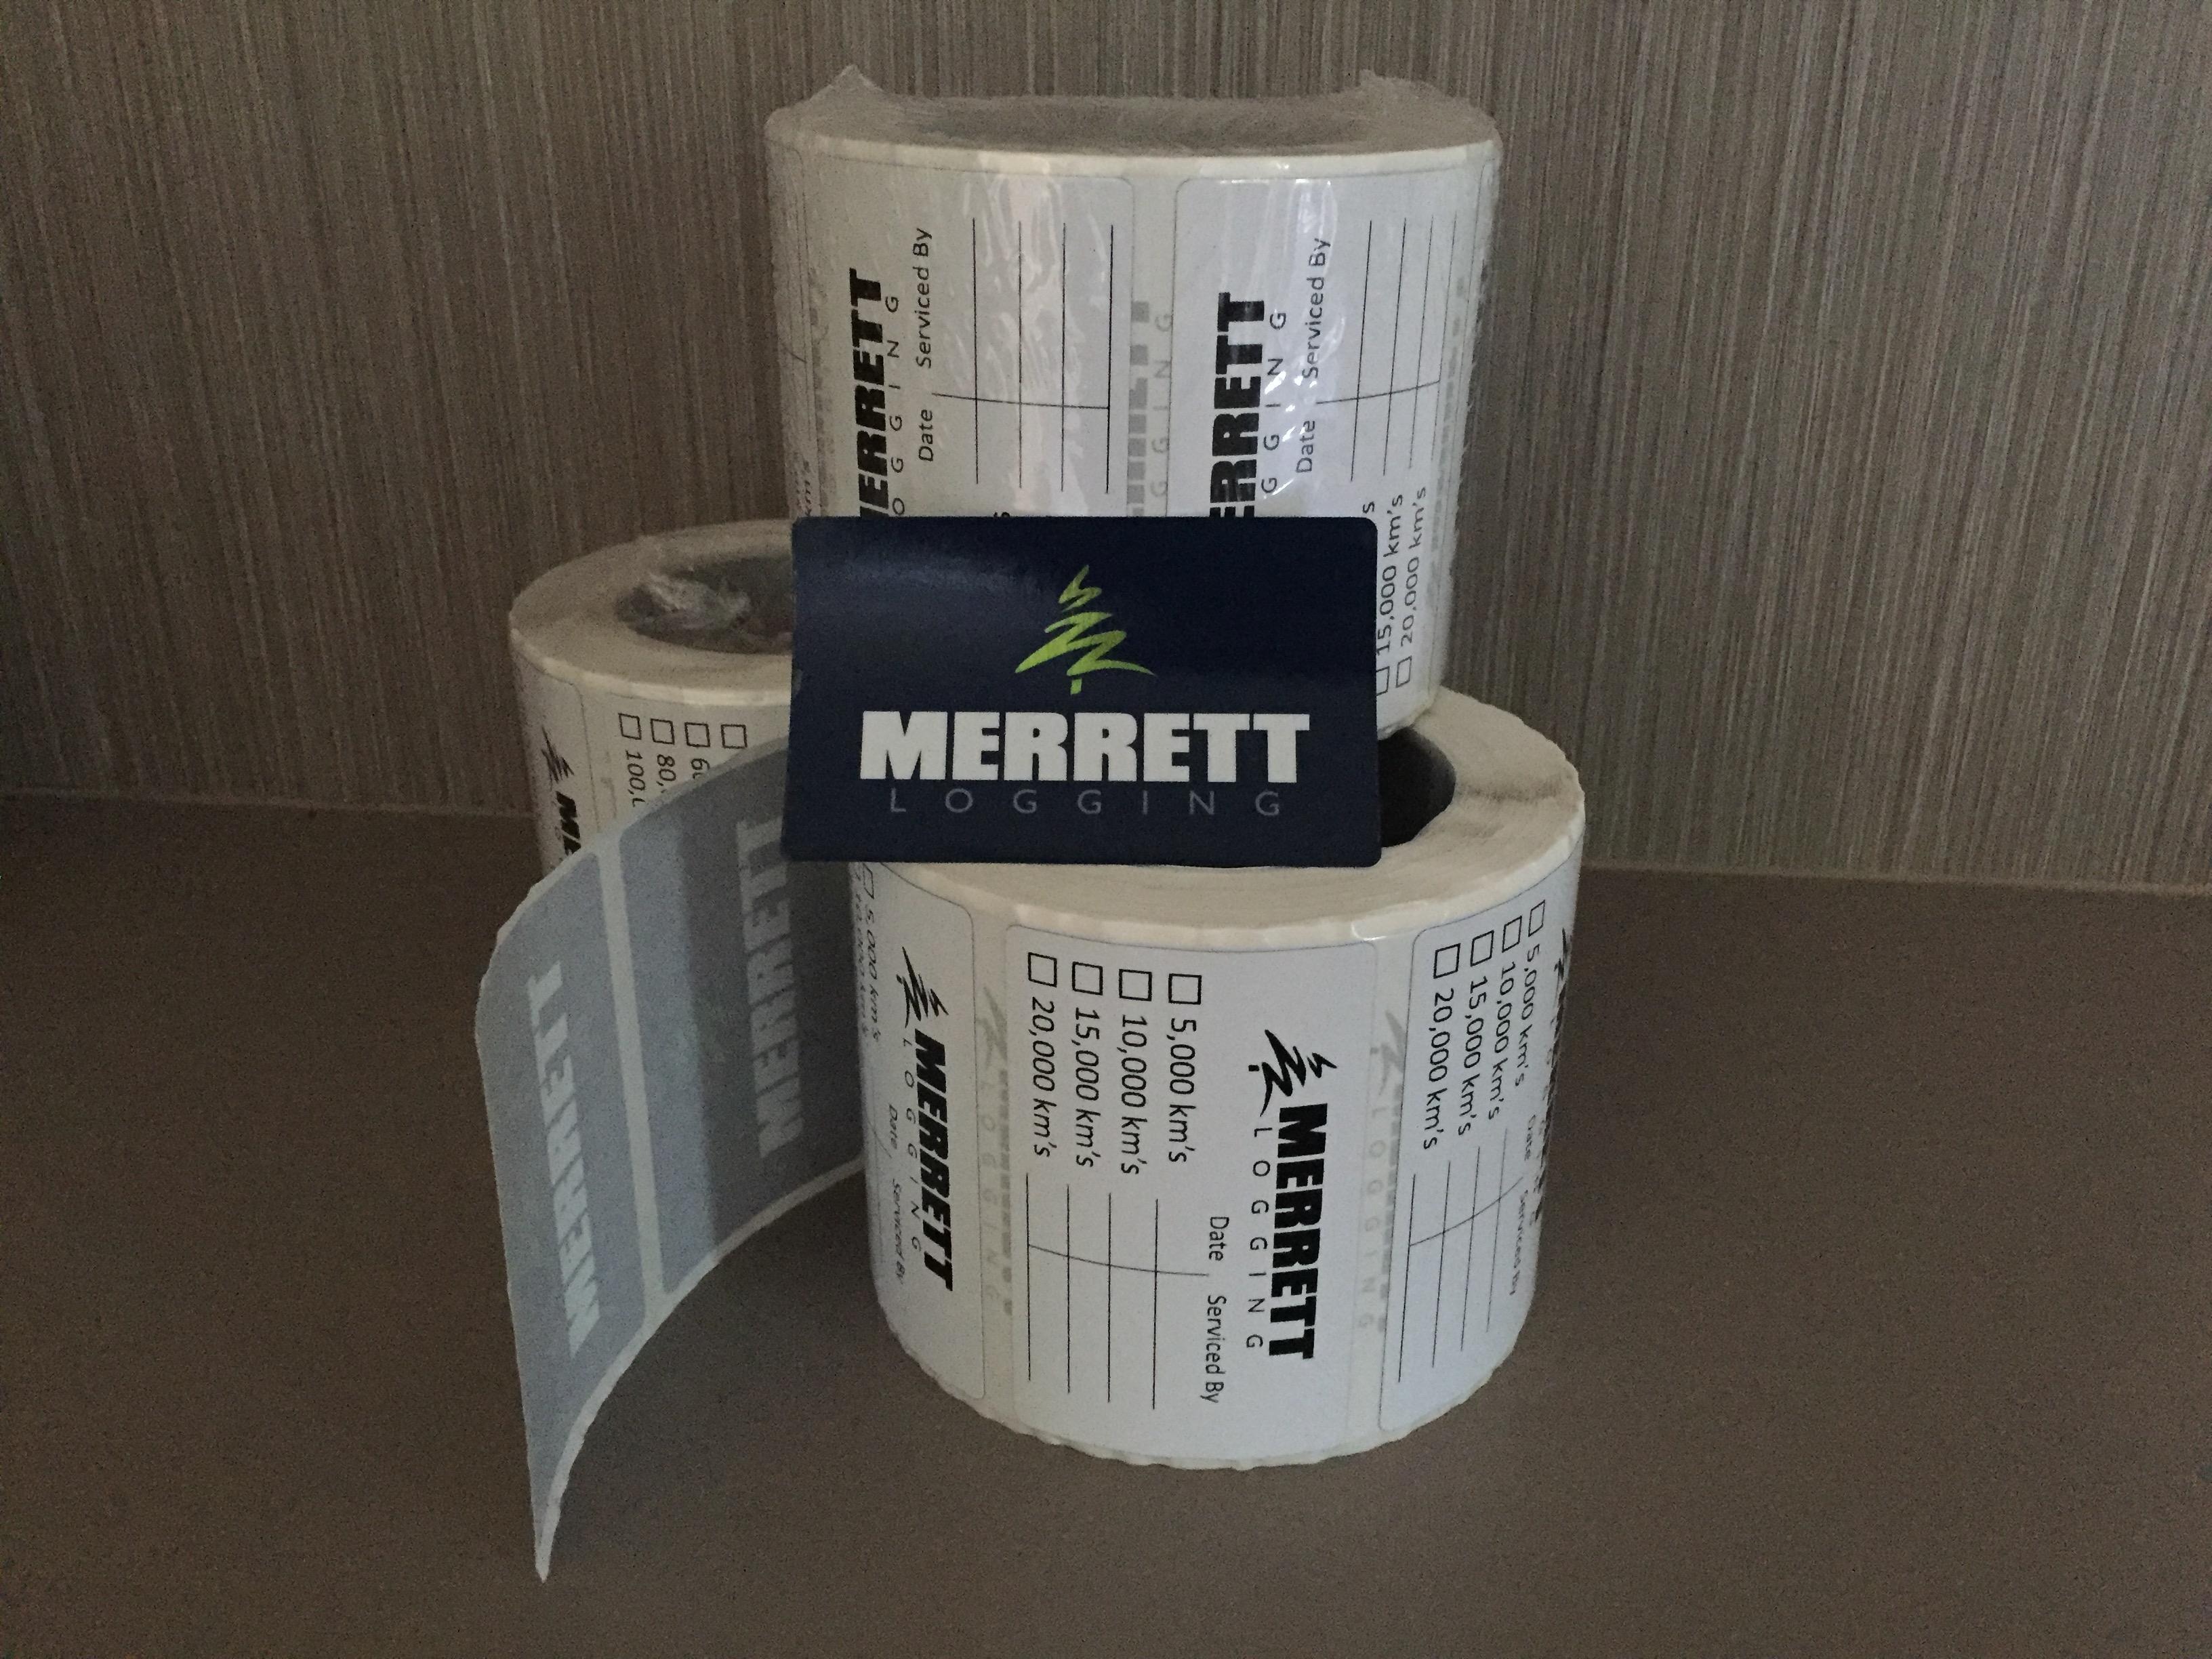 Merrett Logging Service Labels